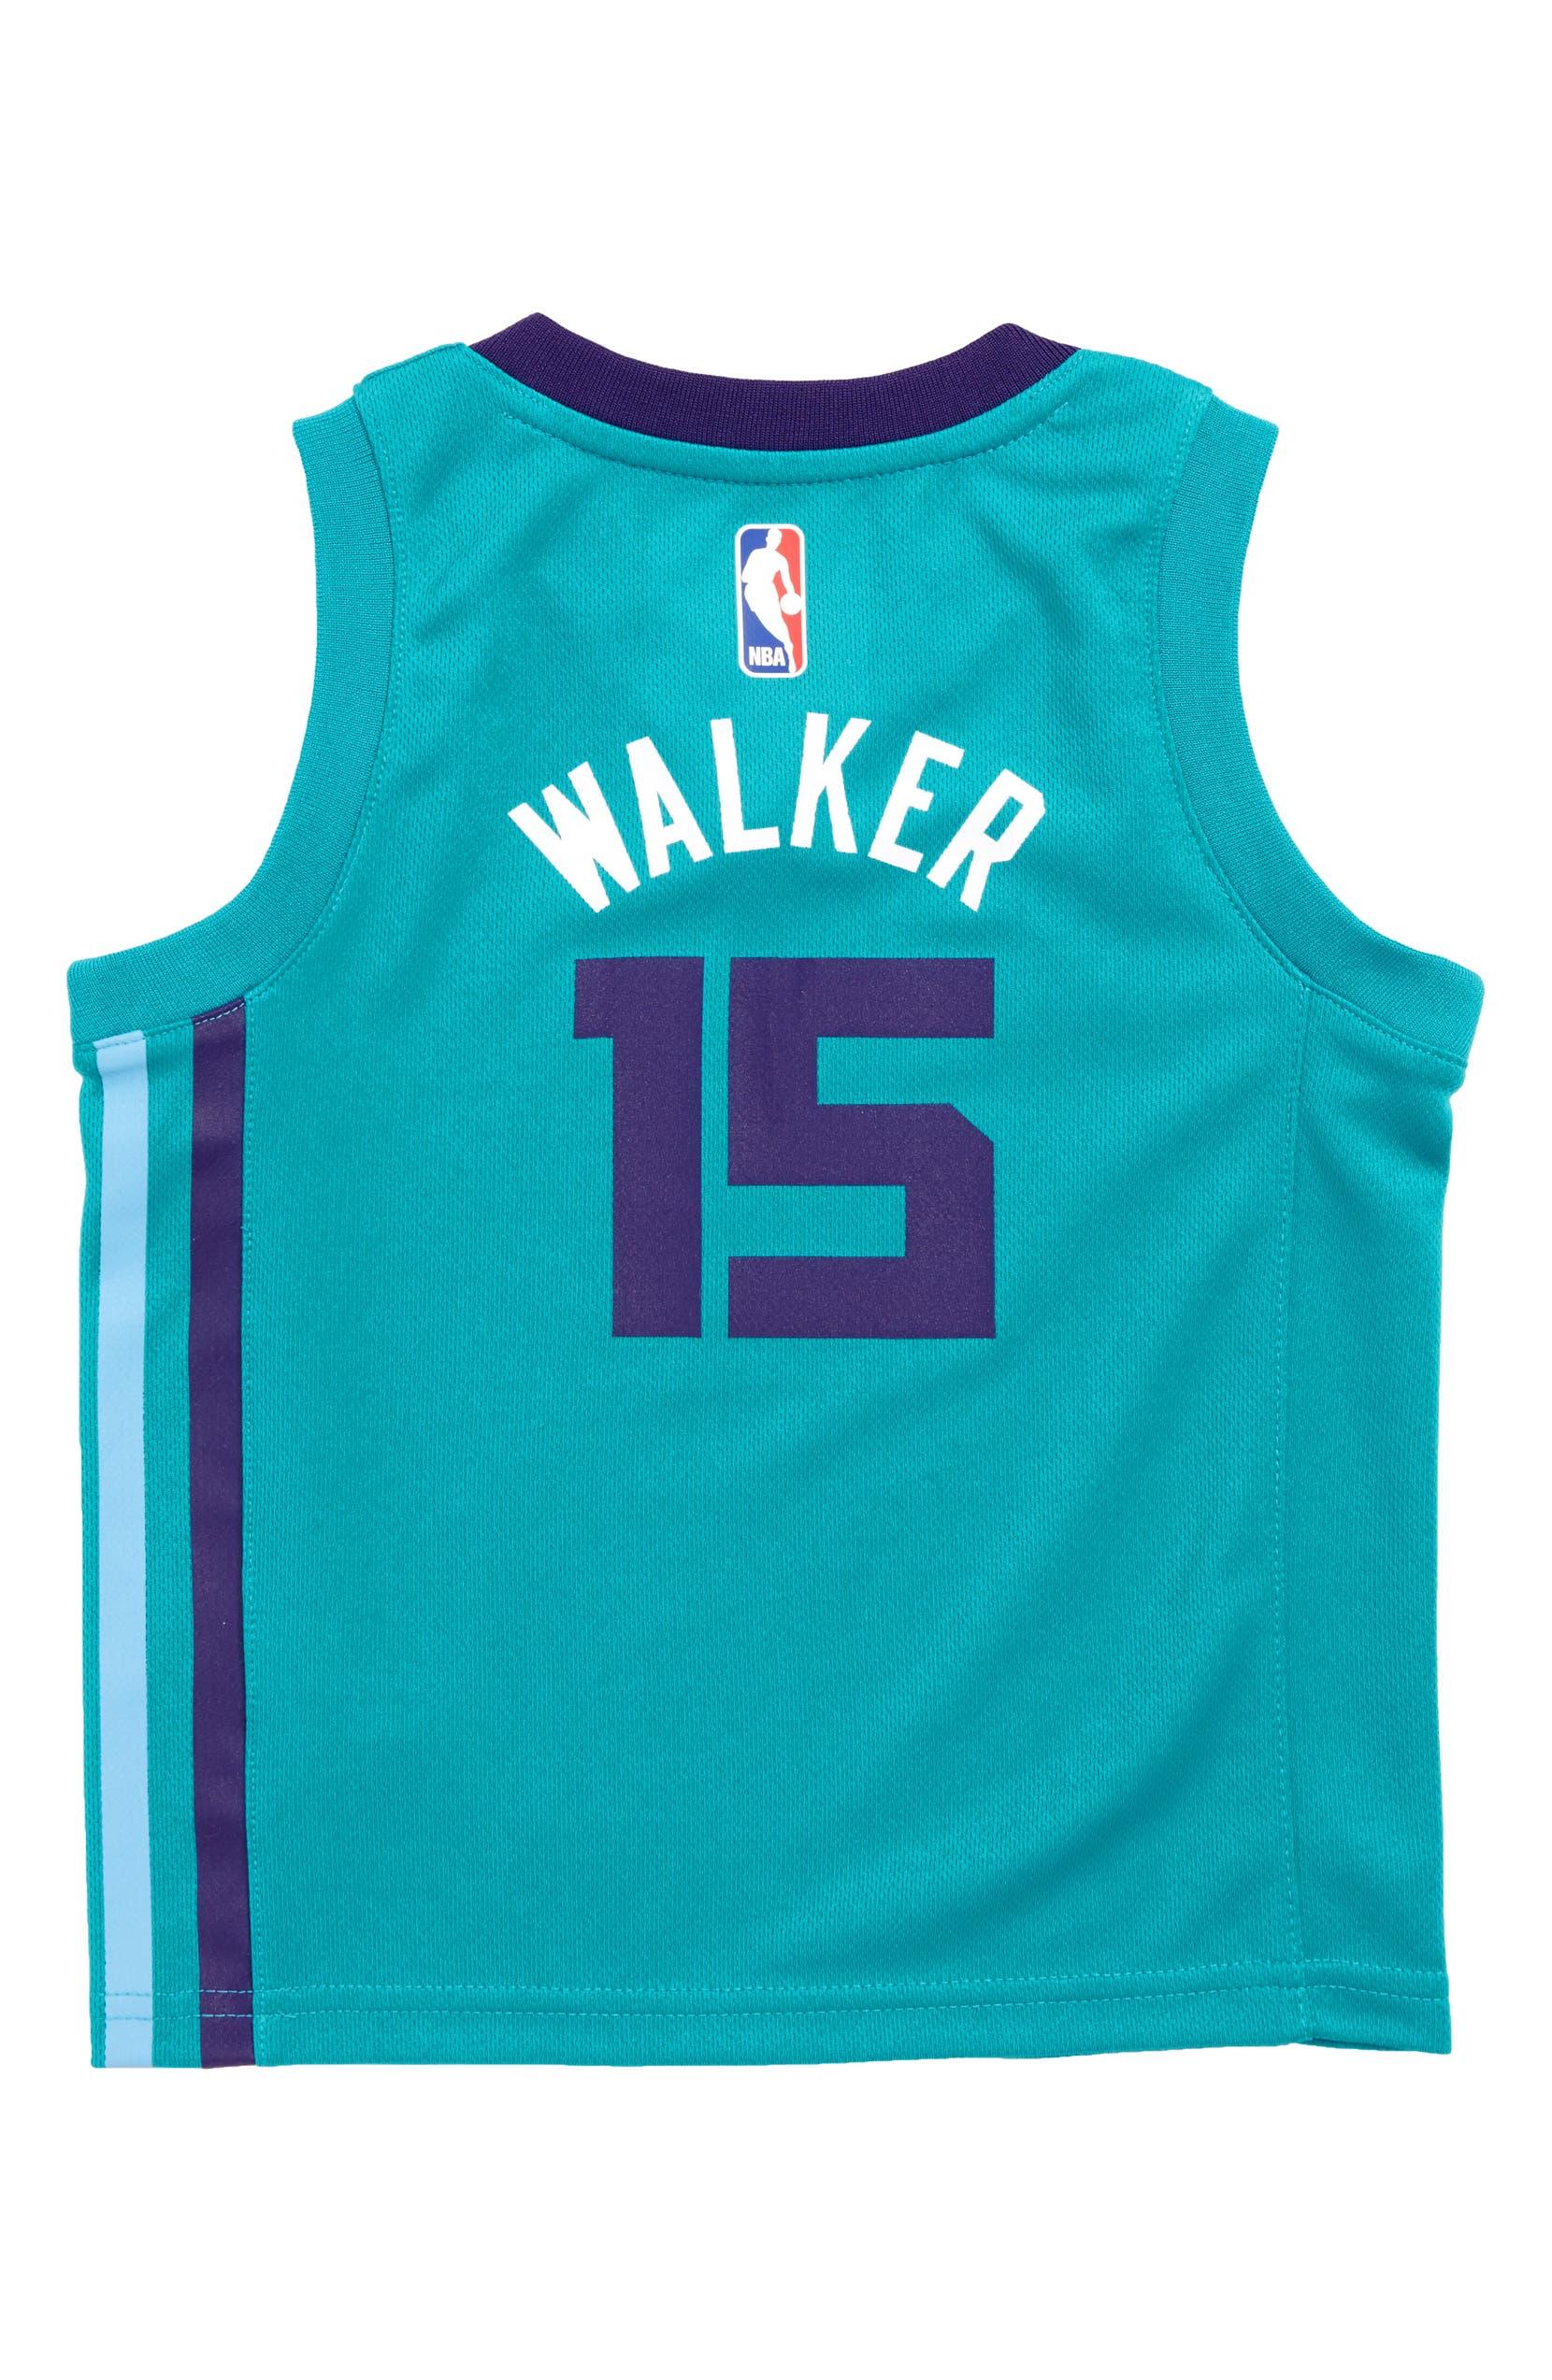 NBA Logo Charlotte Hornets Kemba Walker Basketball Jersey (Toddler Boys)  ff951e705